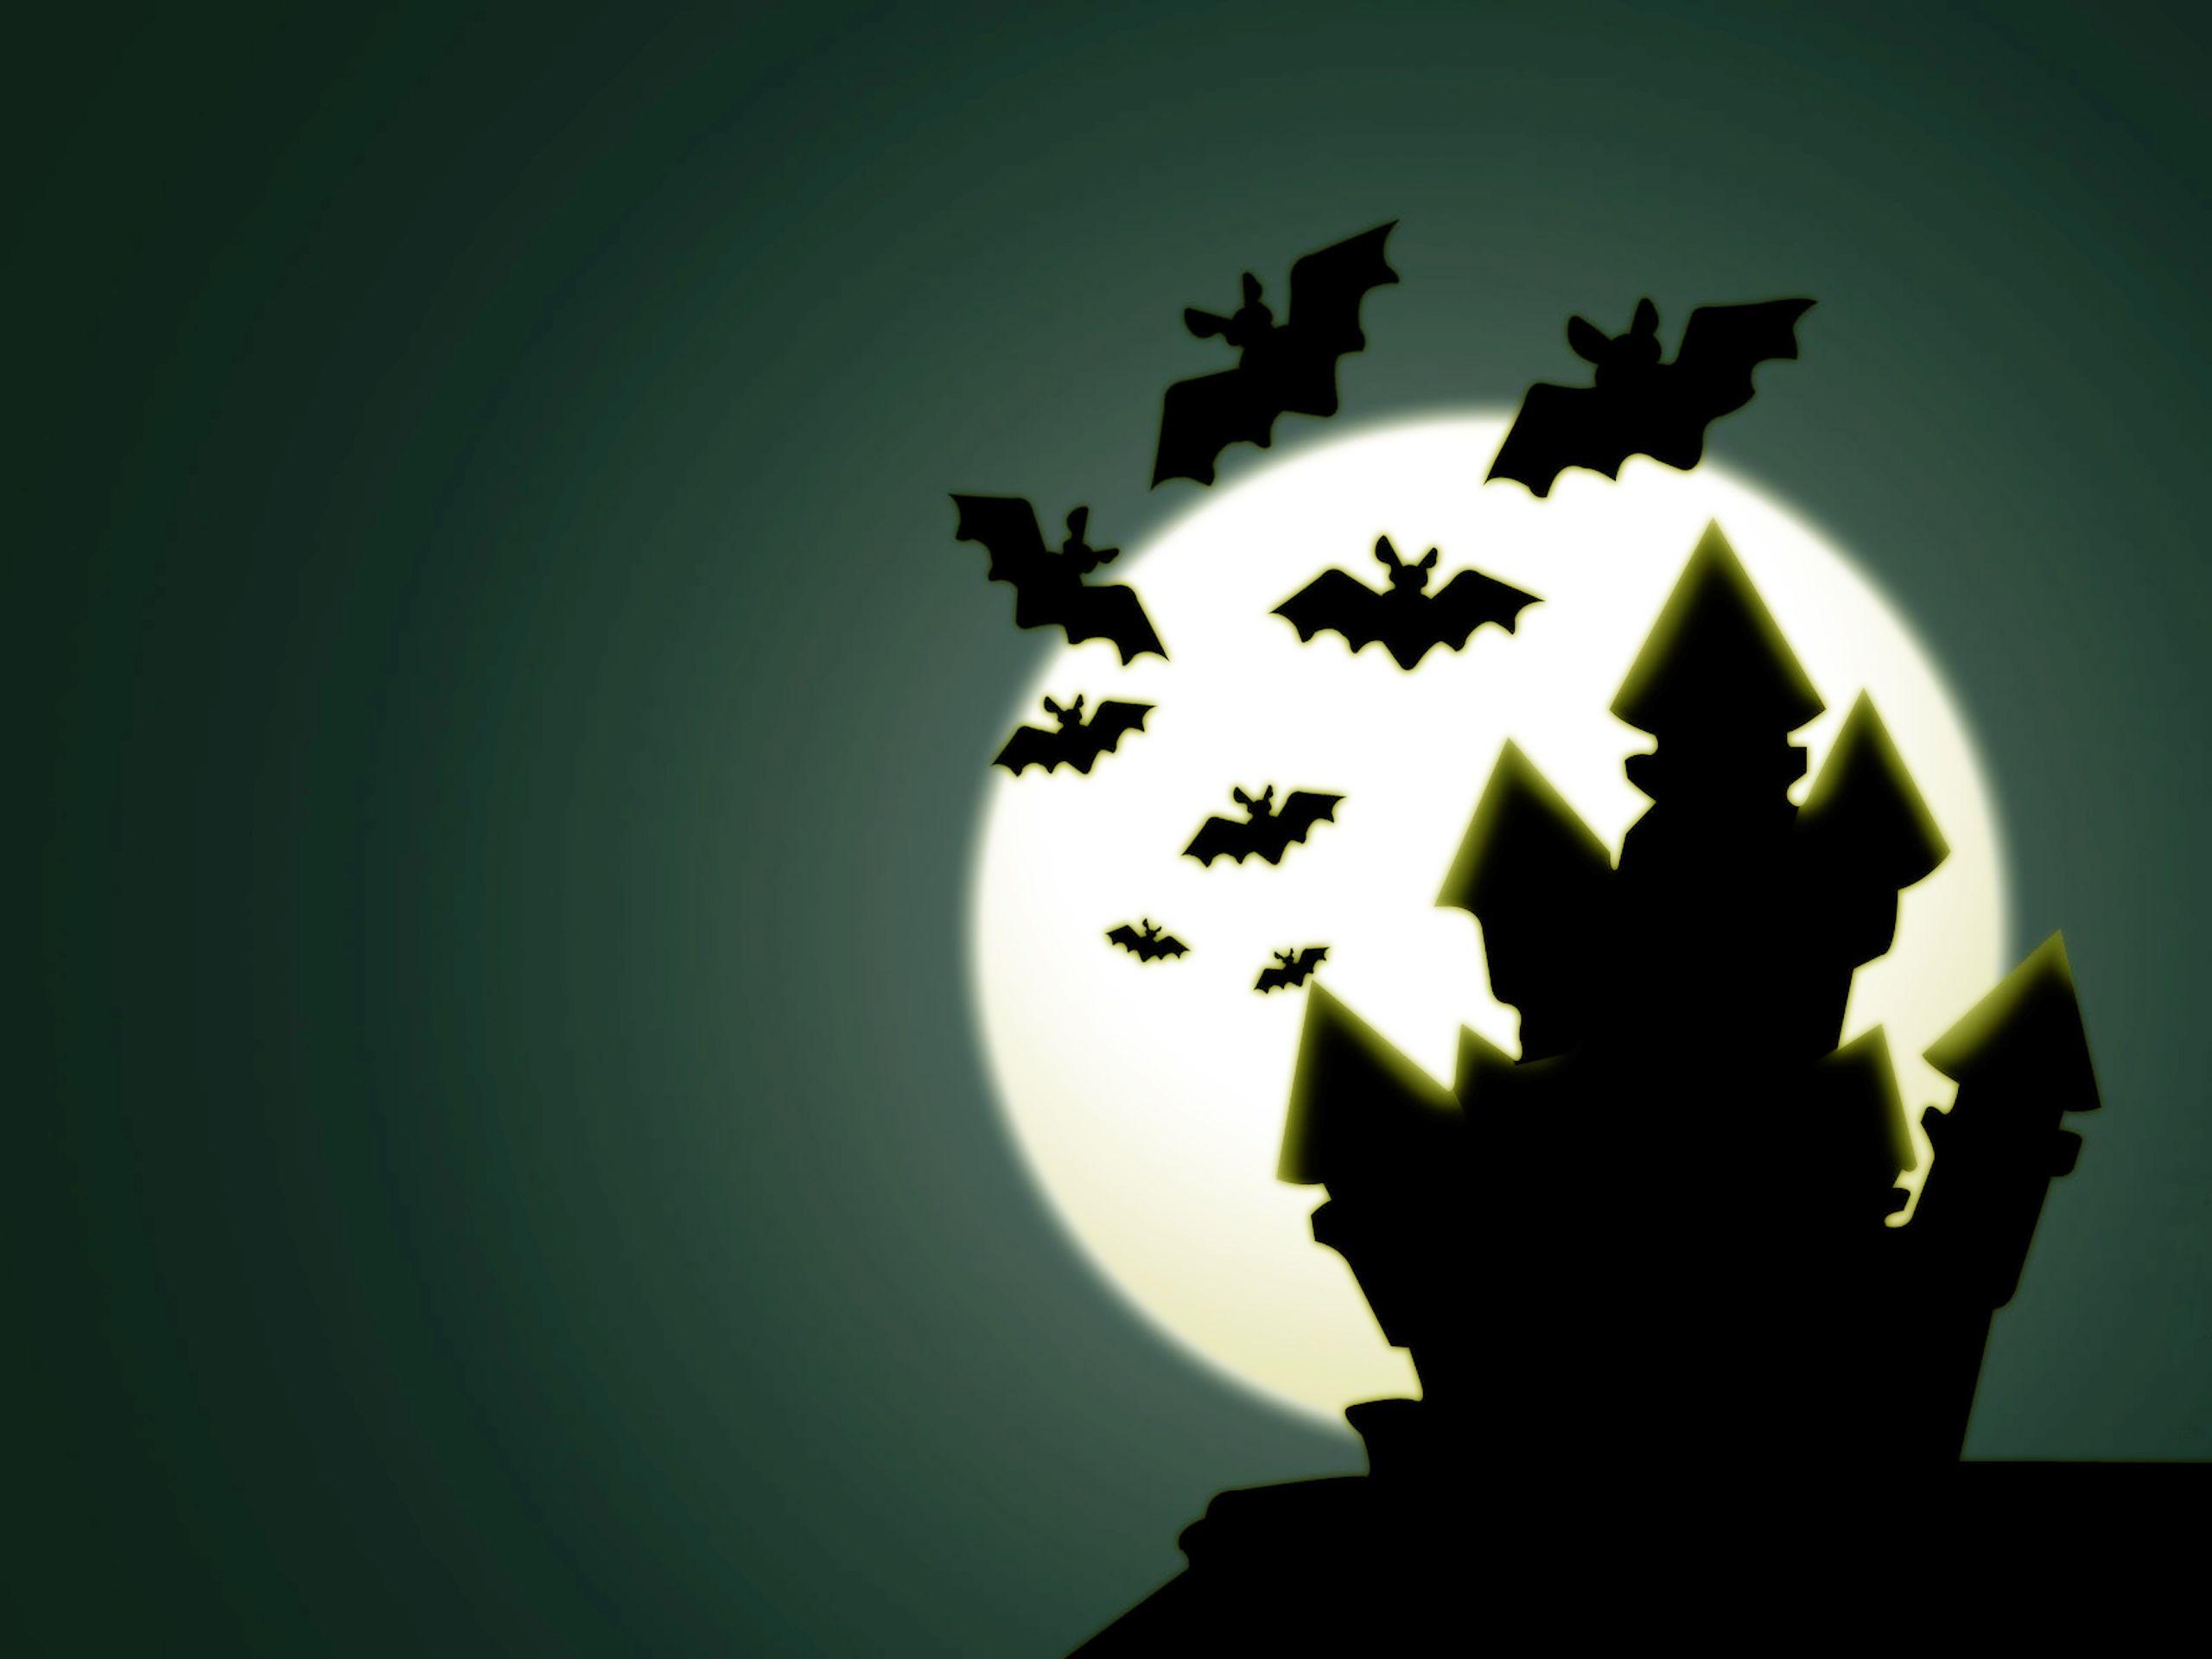 Good Wallpaper Halloween Pinterest - 45ecd6234f562e9a0a54a0a5f5b30cd3  You Should Have_98135.jpg